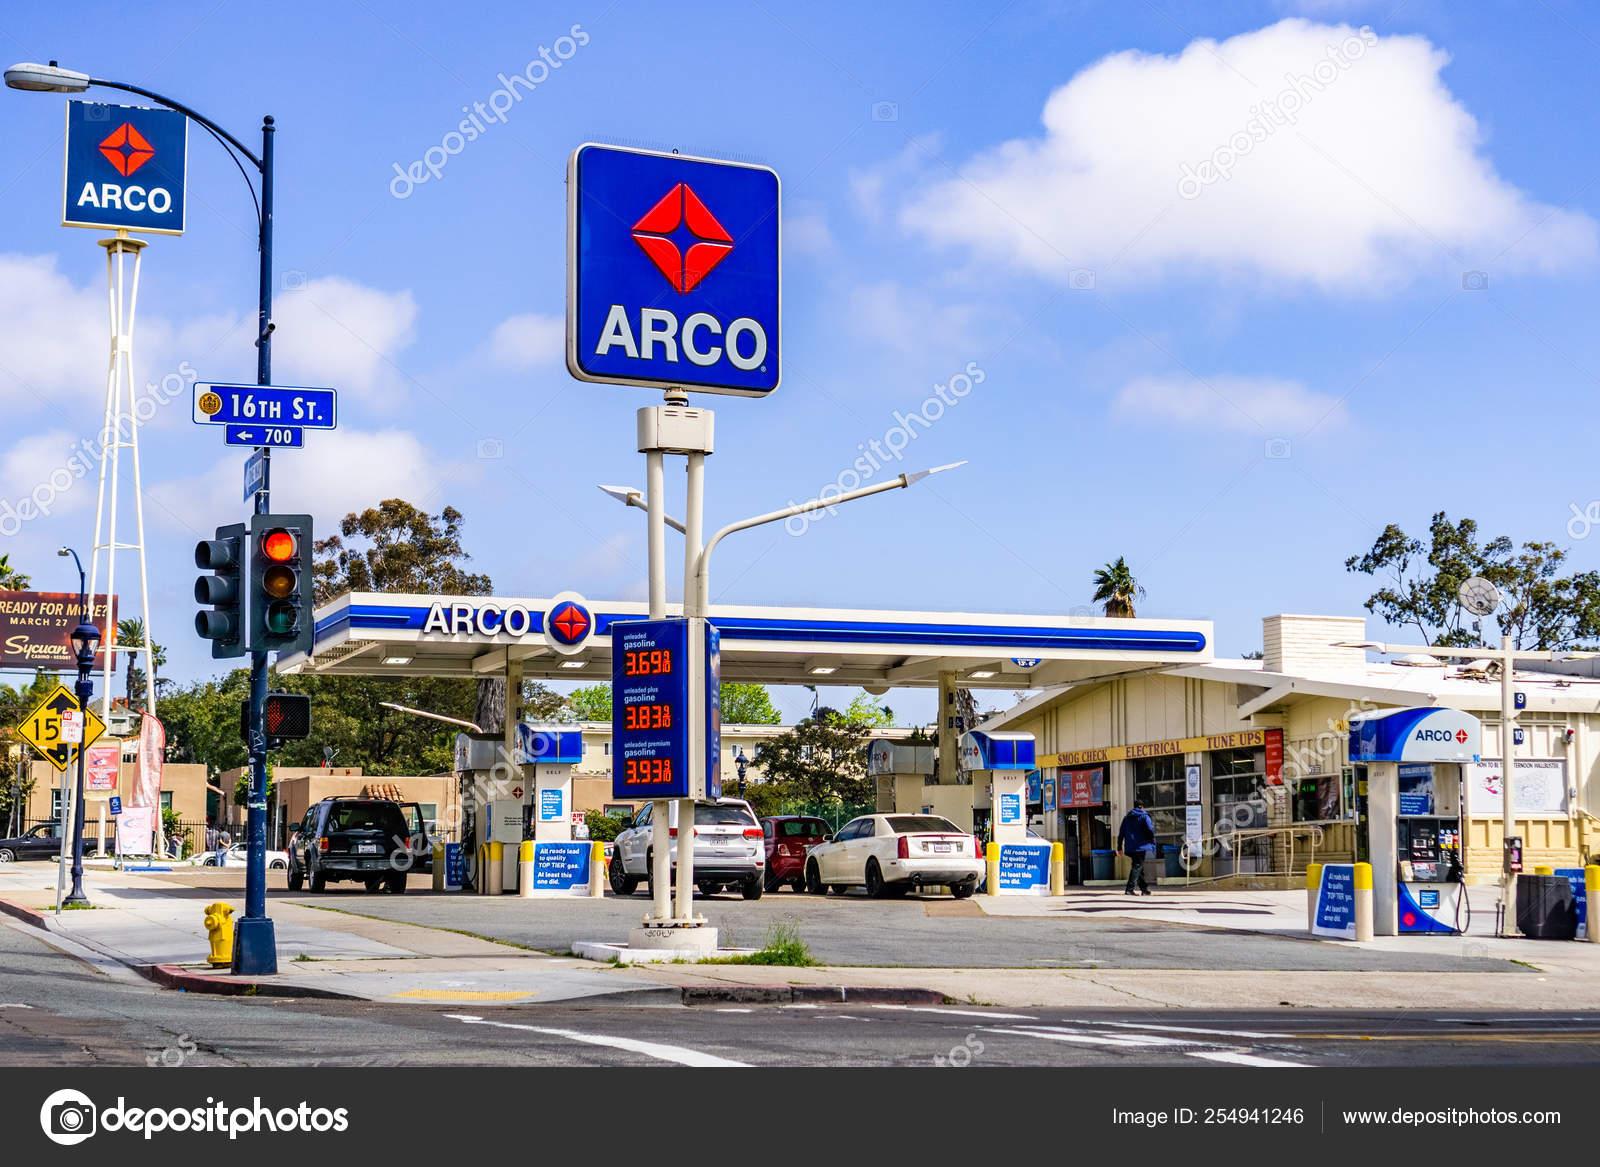 Arco Gas Stations >> March 19 2019 San Diego Ca Usa Arco Gas Station